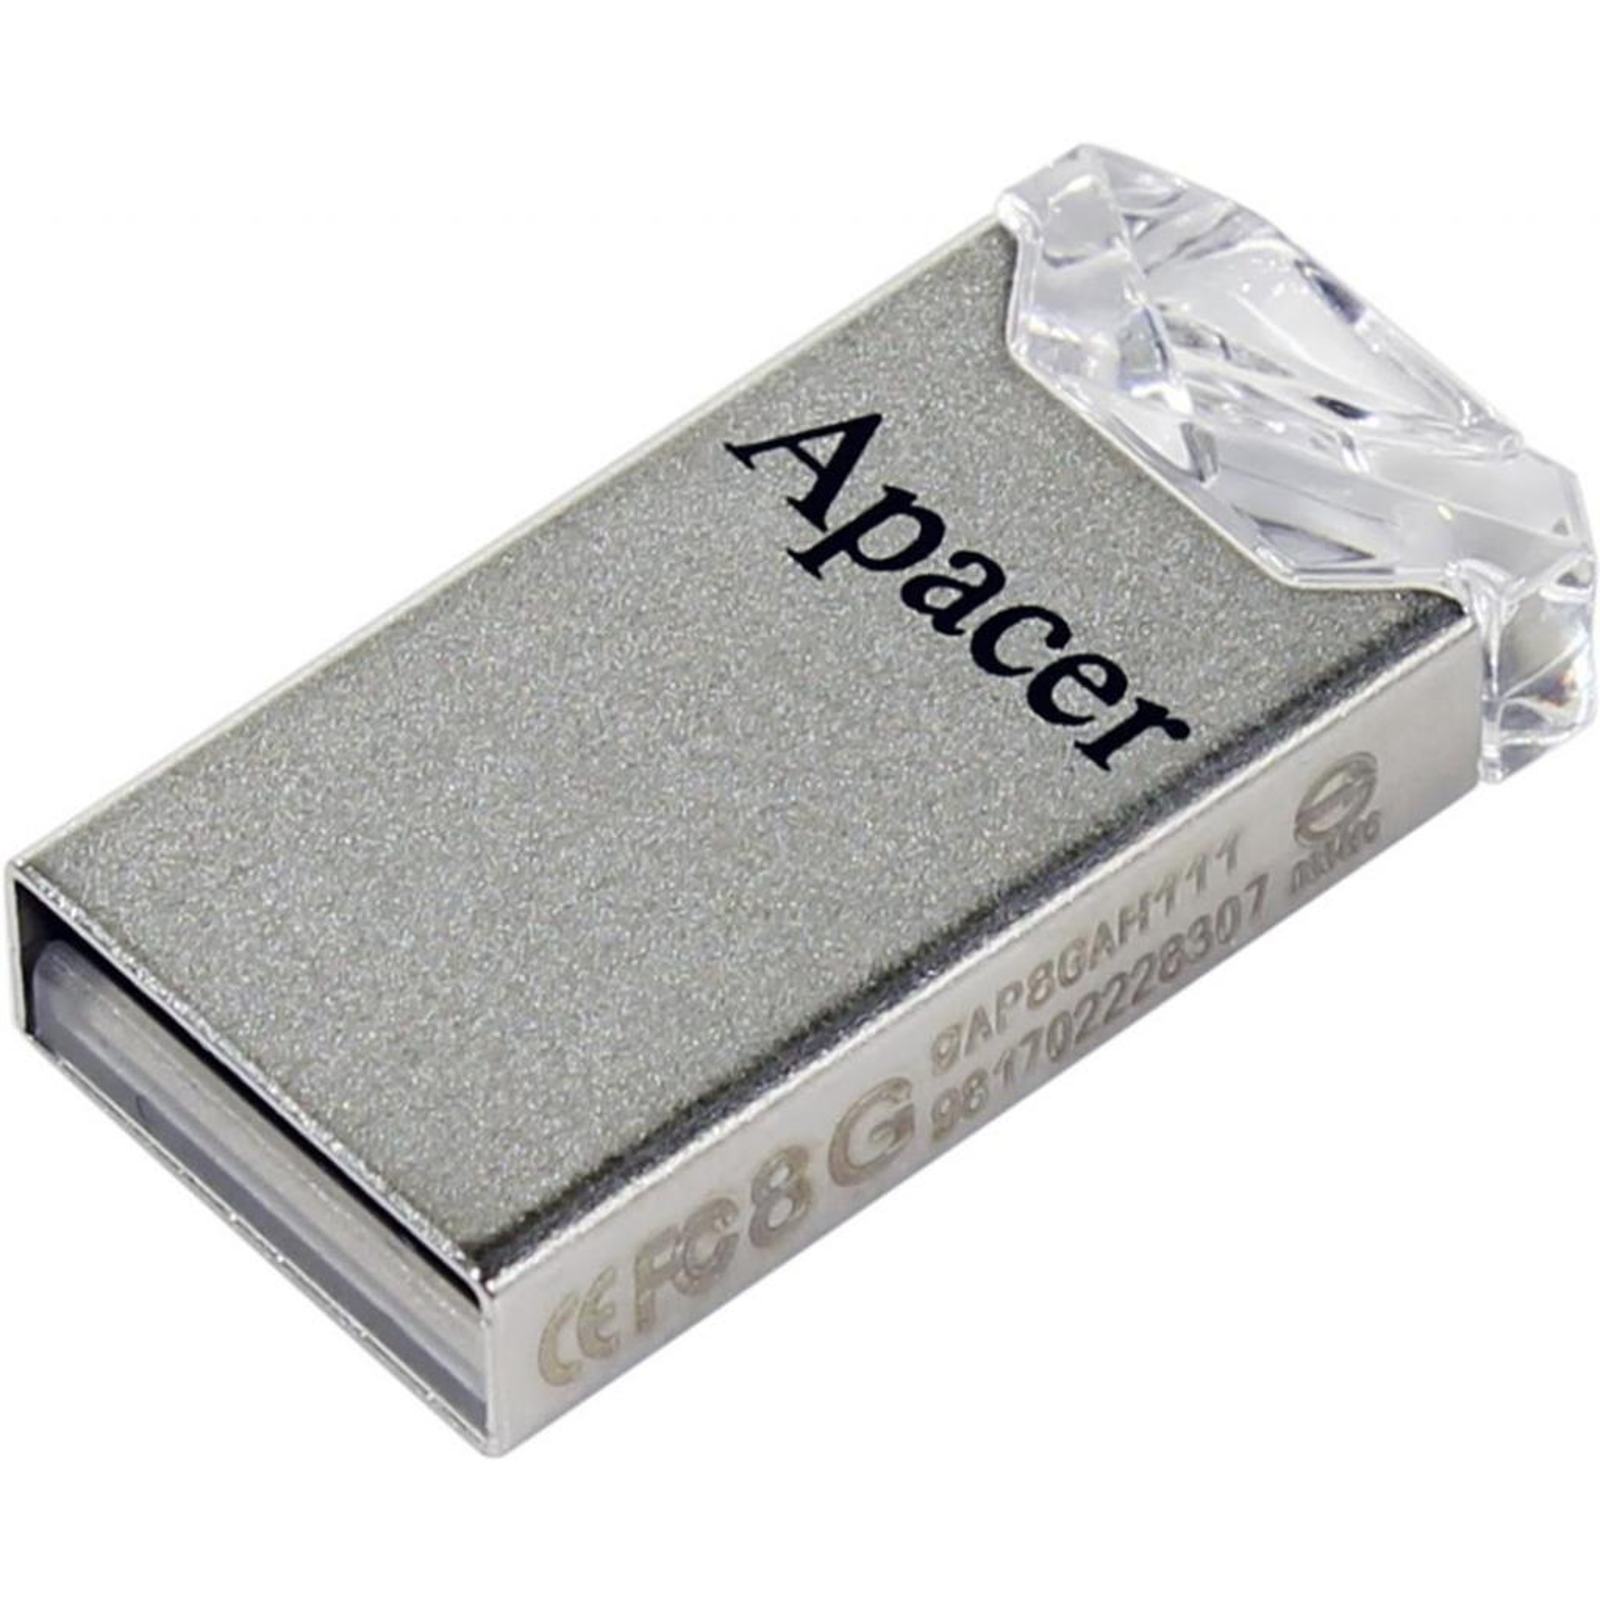 USB флеш накопитель Apacer 64GB AH111 Crystal USB 2.0 (AP64GAH111CR-1) изображение 2